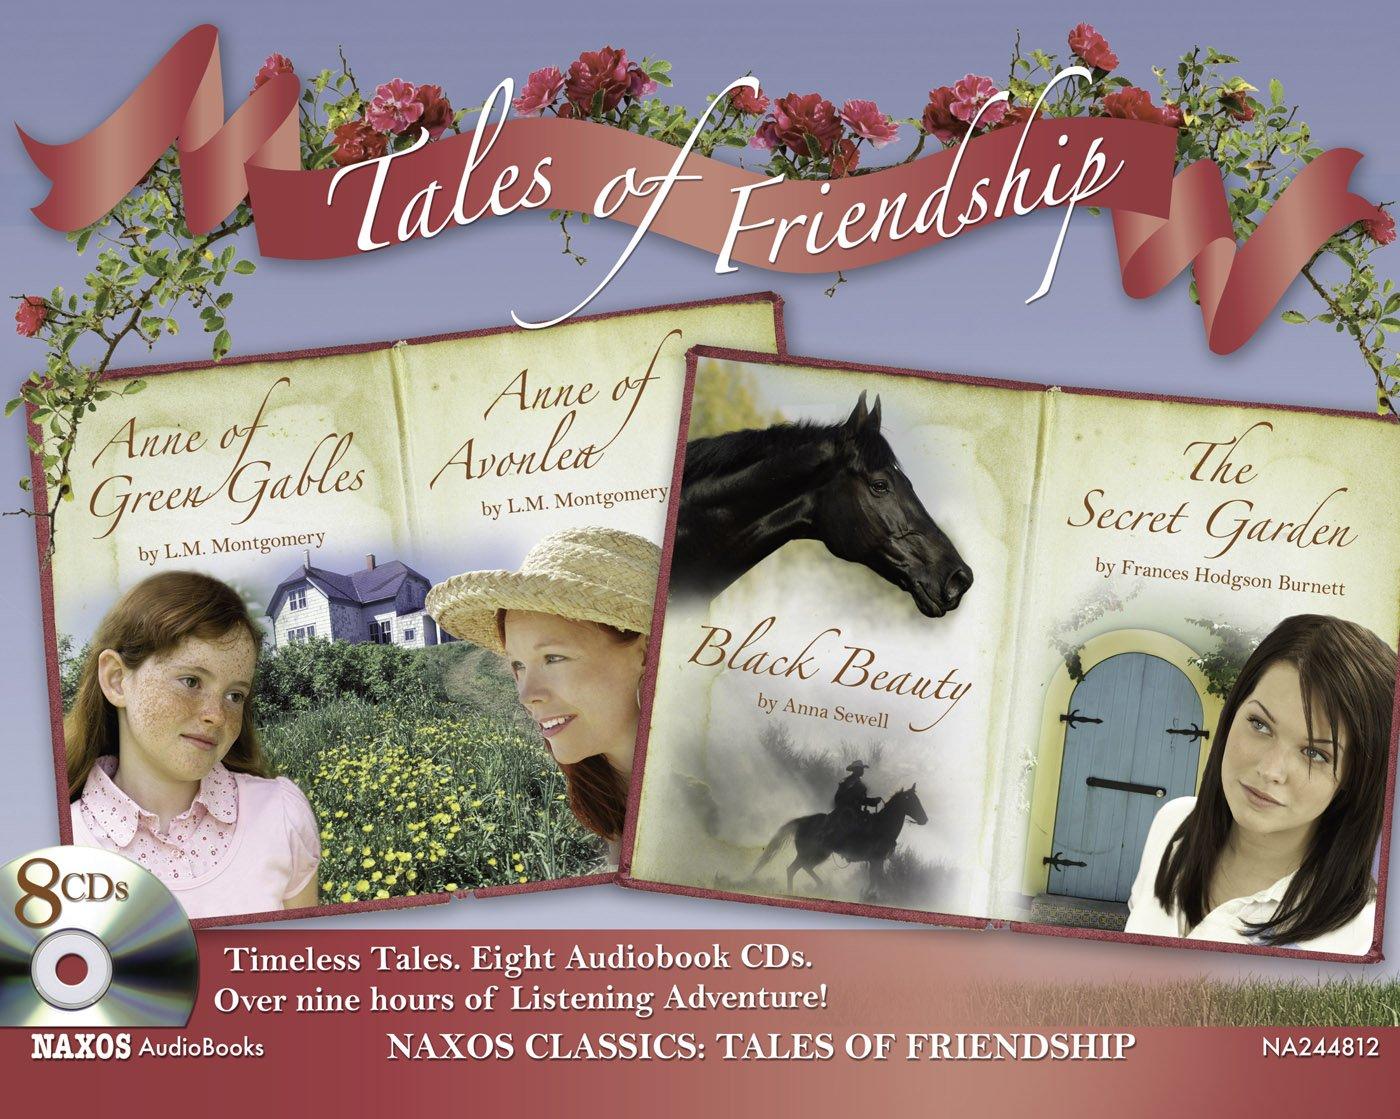 Tales of Friendship: Anne of Green Gables; Anne of Avonlea; Black Beauty; The Secret Garden (Naxos Classics)